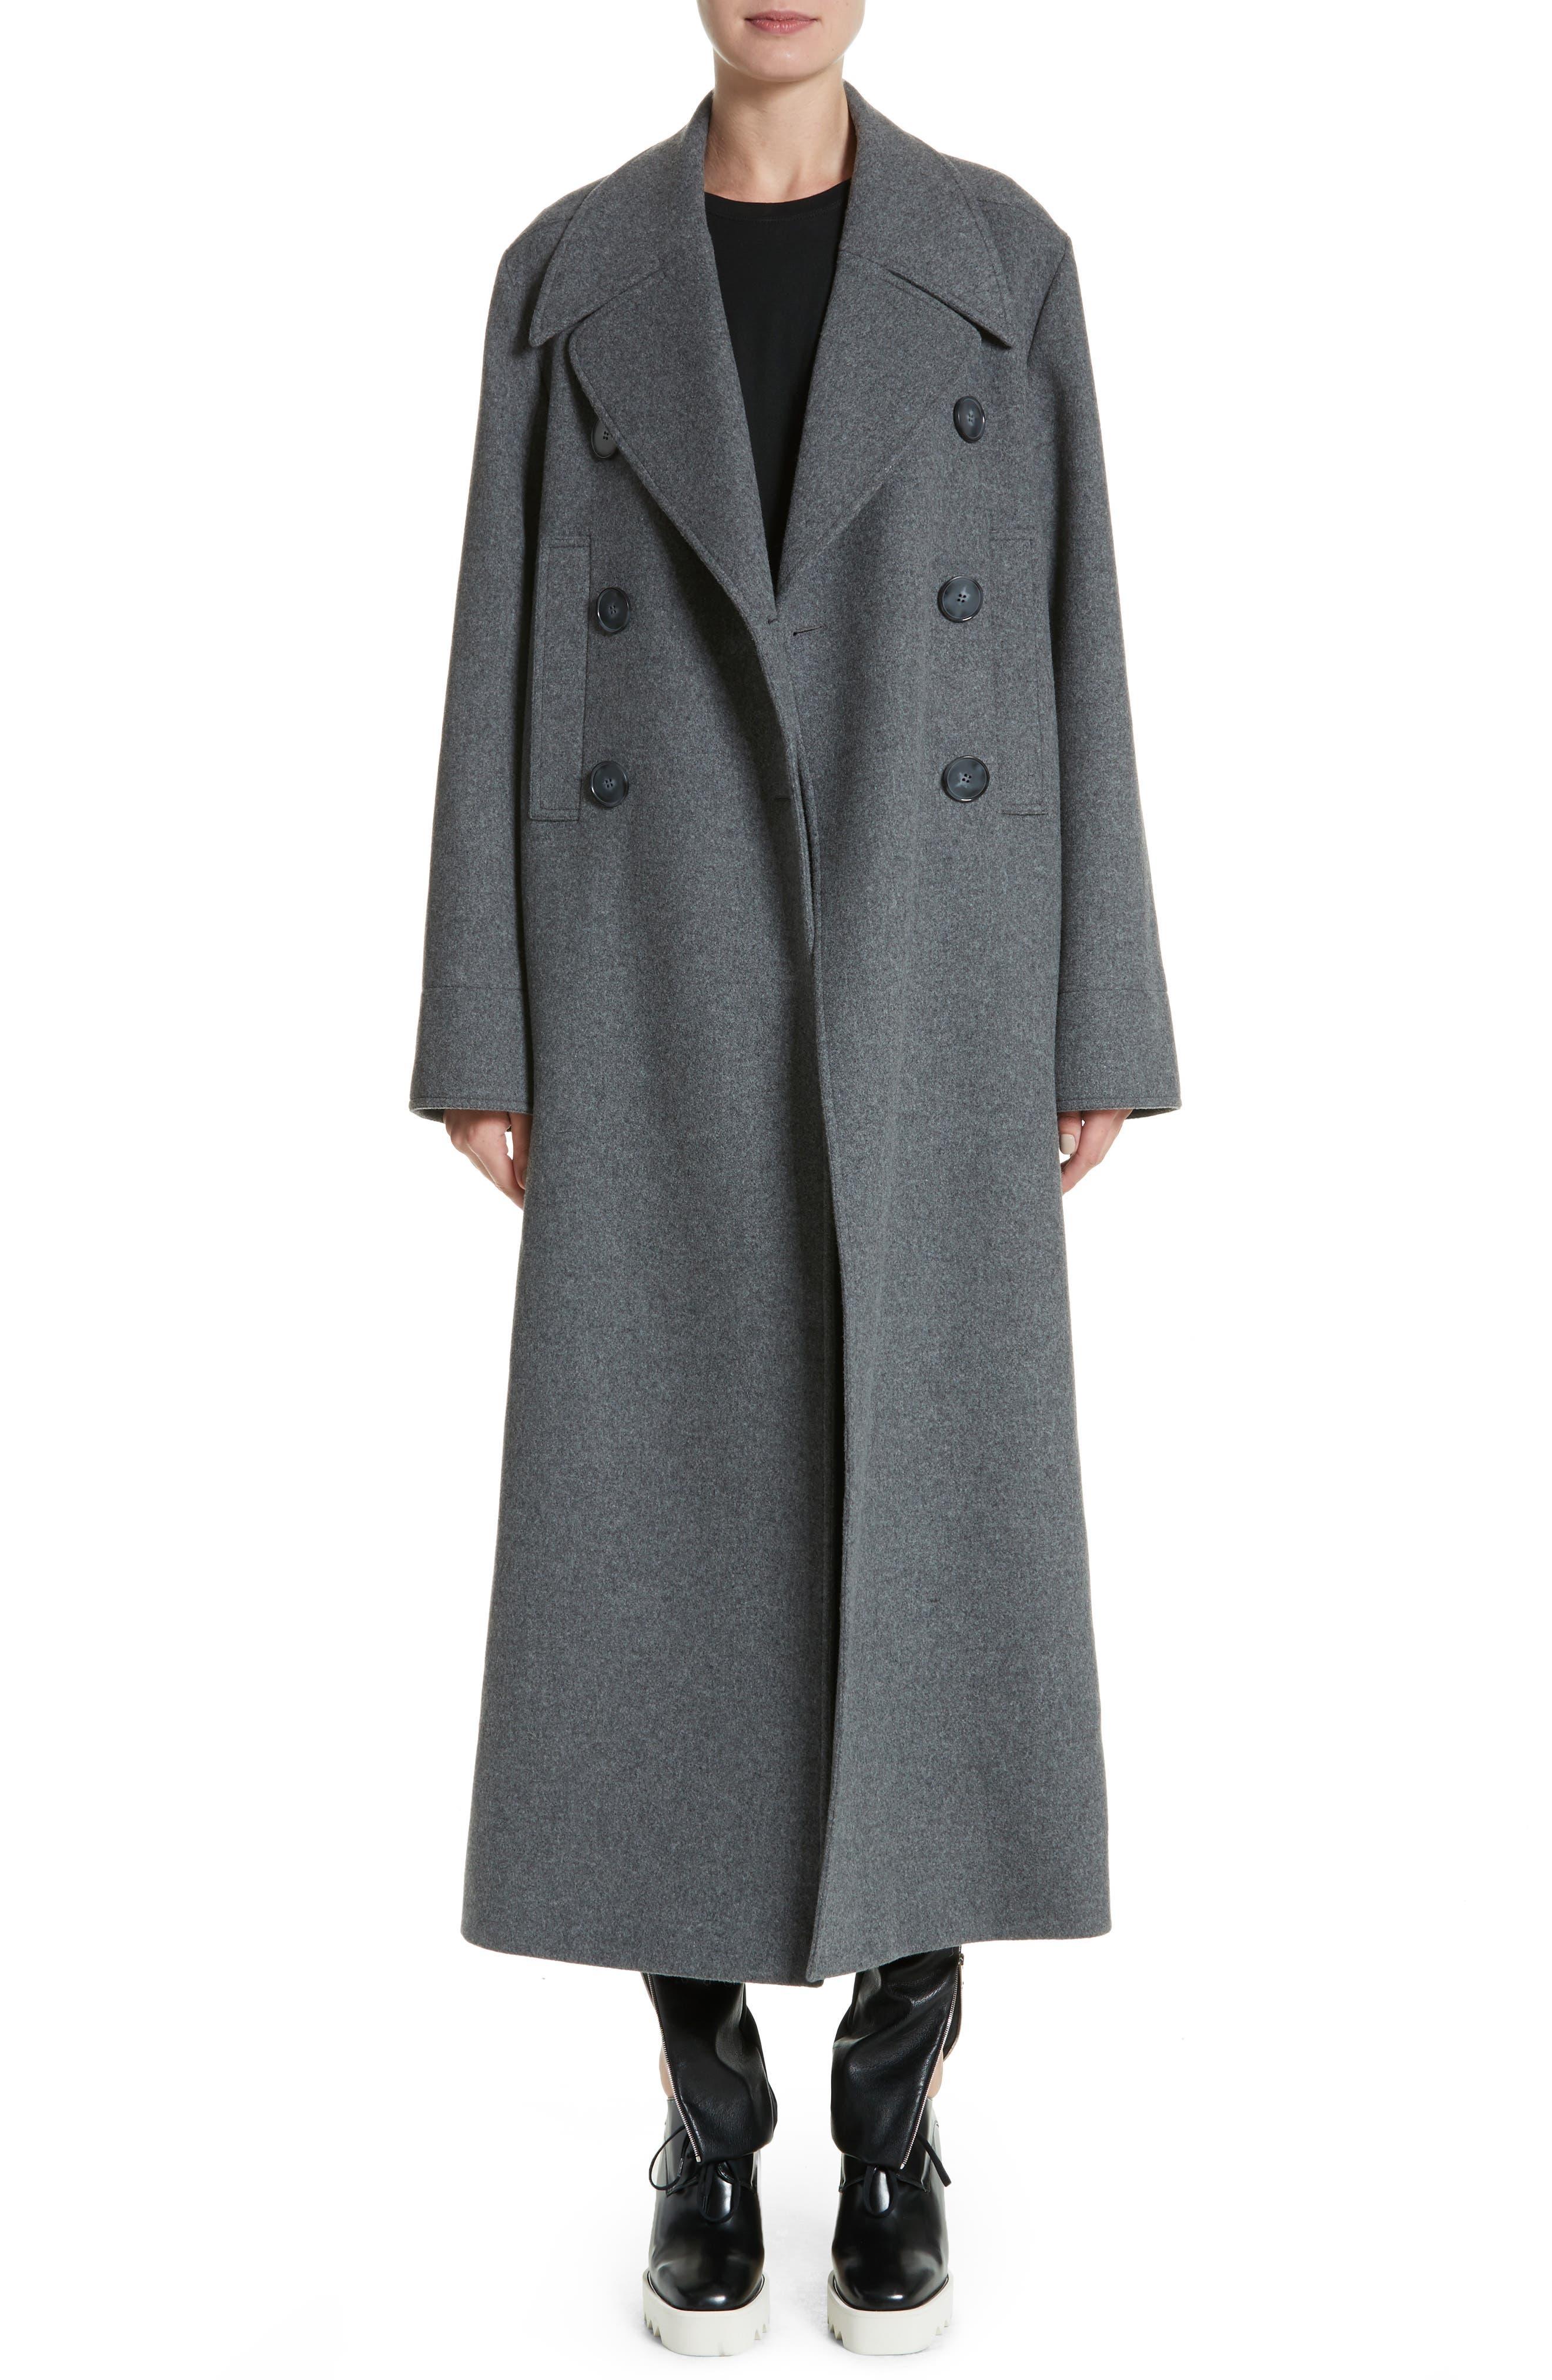 Edwina Long Double Breasted Wool Blend Coat,                             Main thumbnail 1, color,                             076